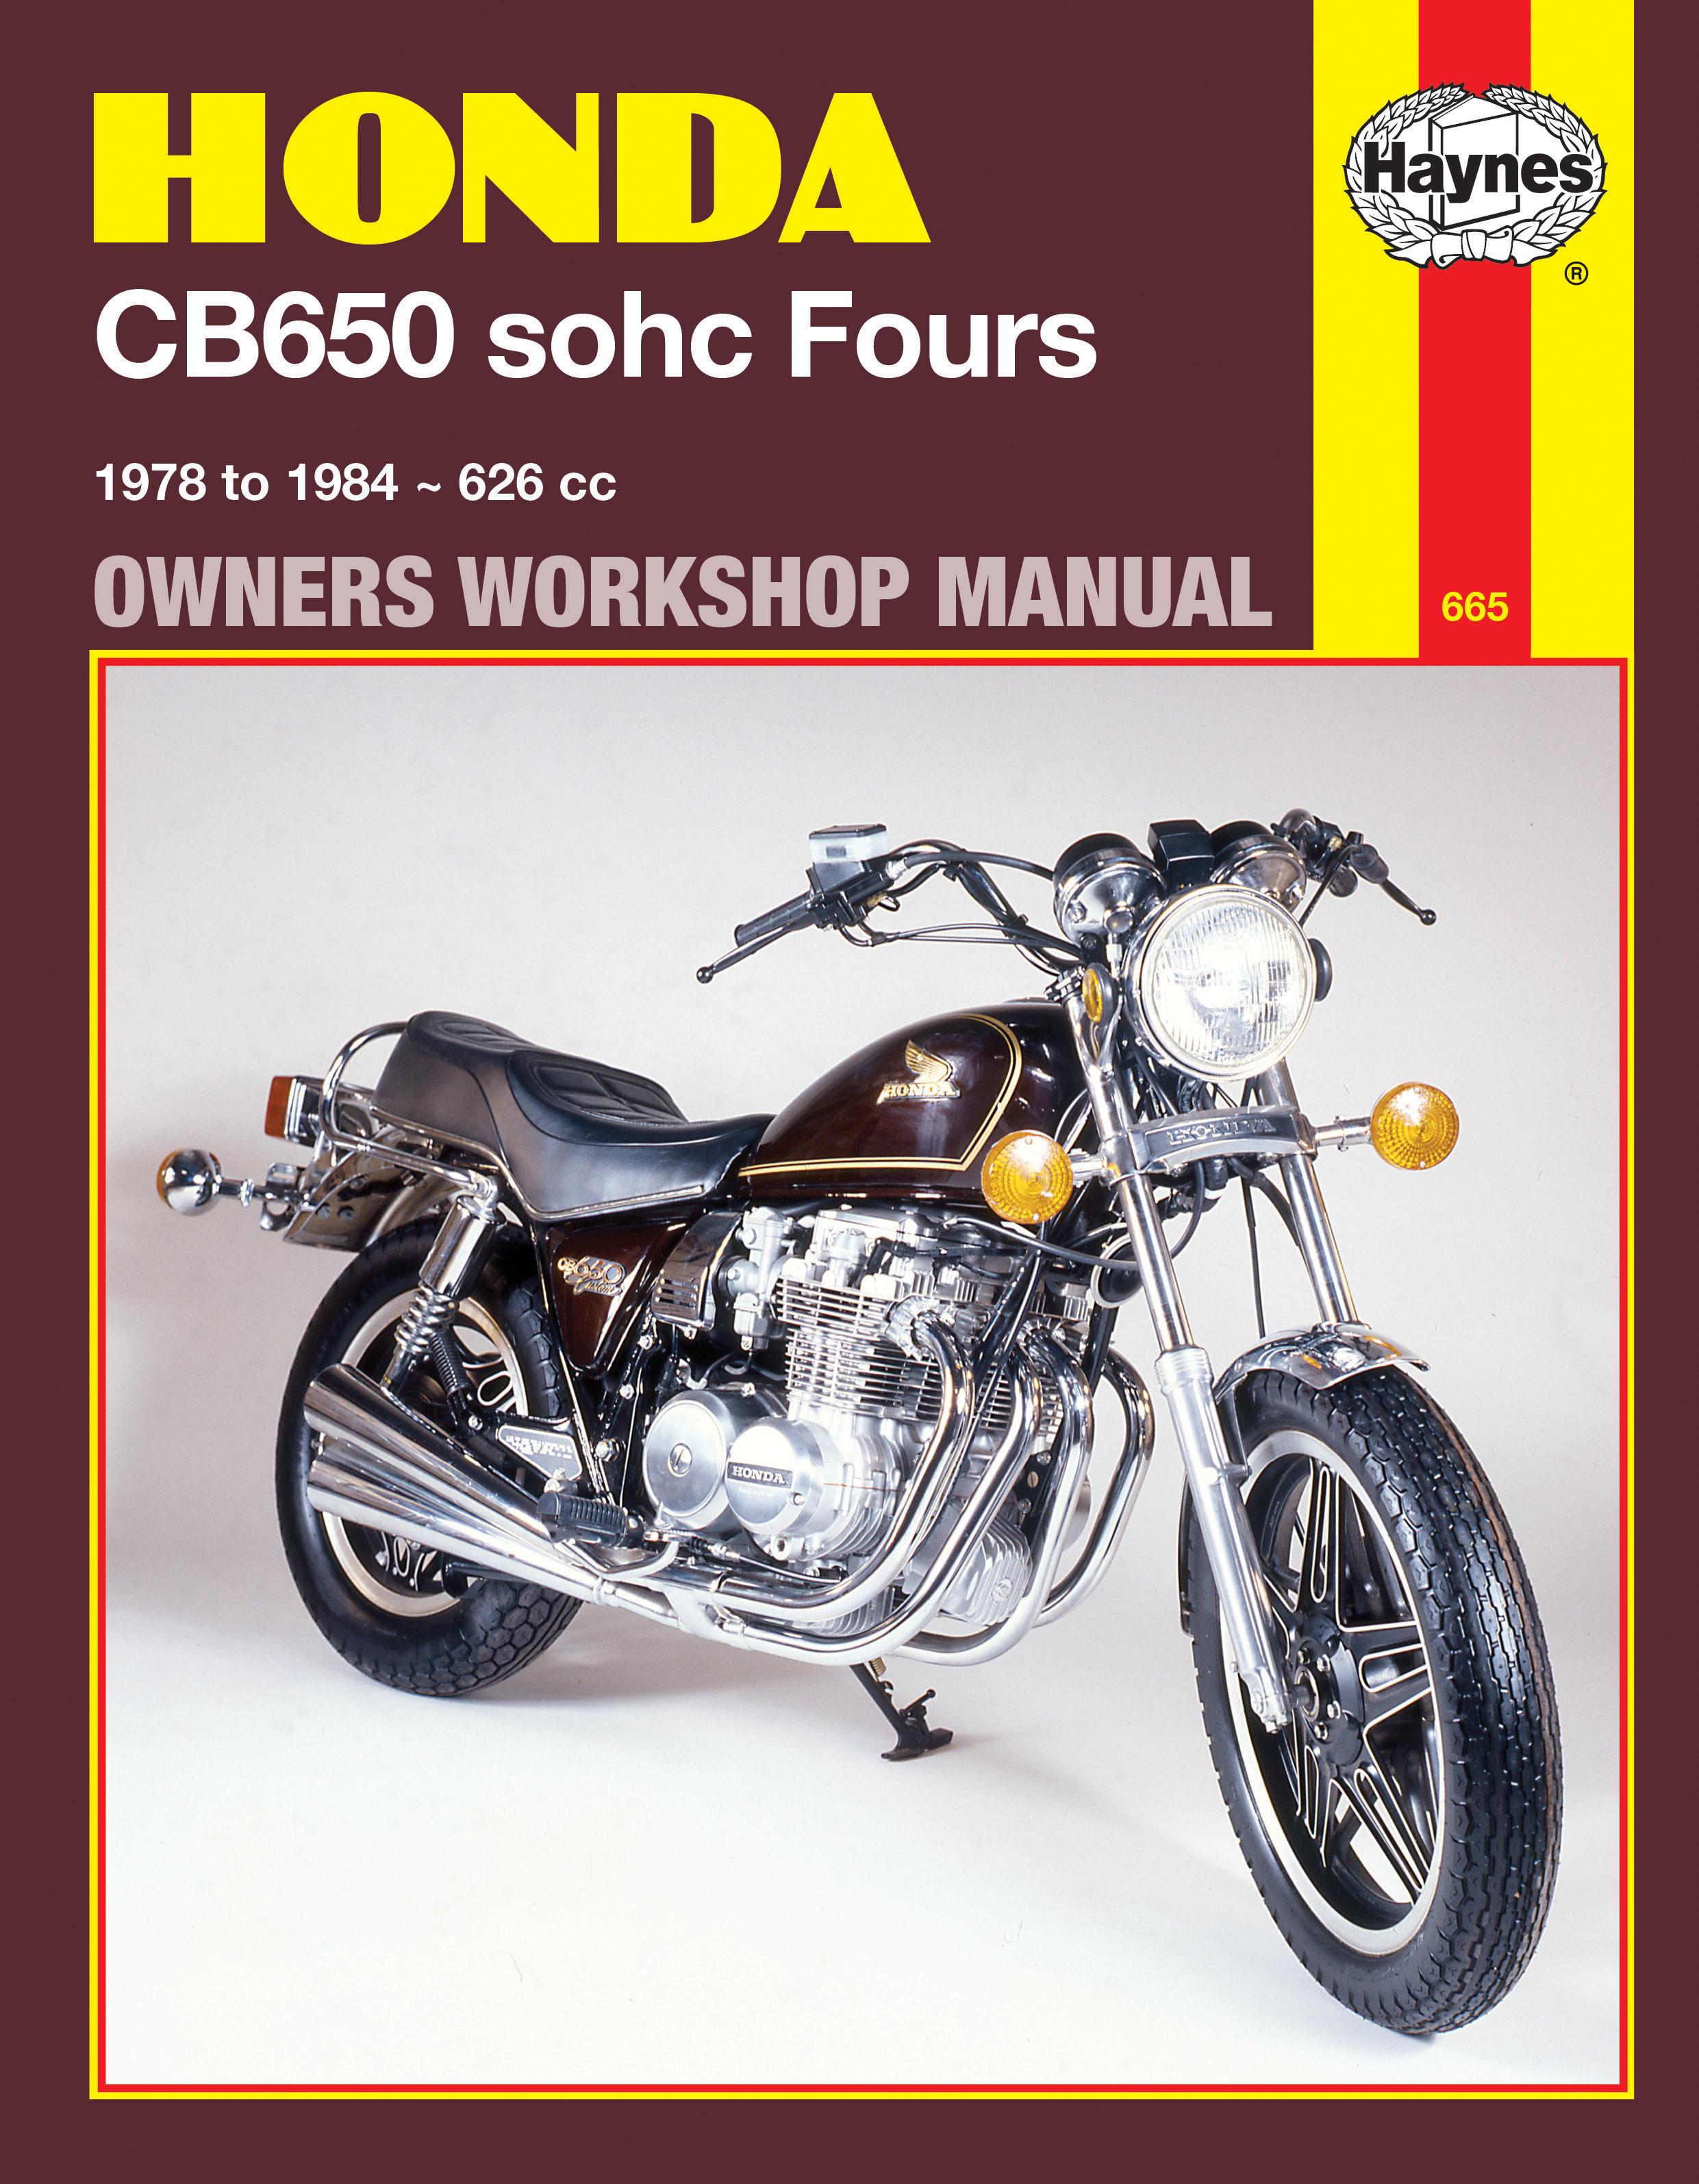 Honda CB650 sohc Fours (78 - 84) Haynes Repair Manual